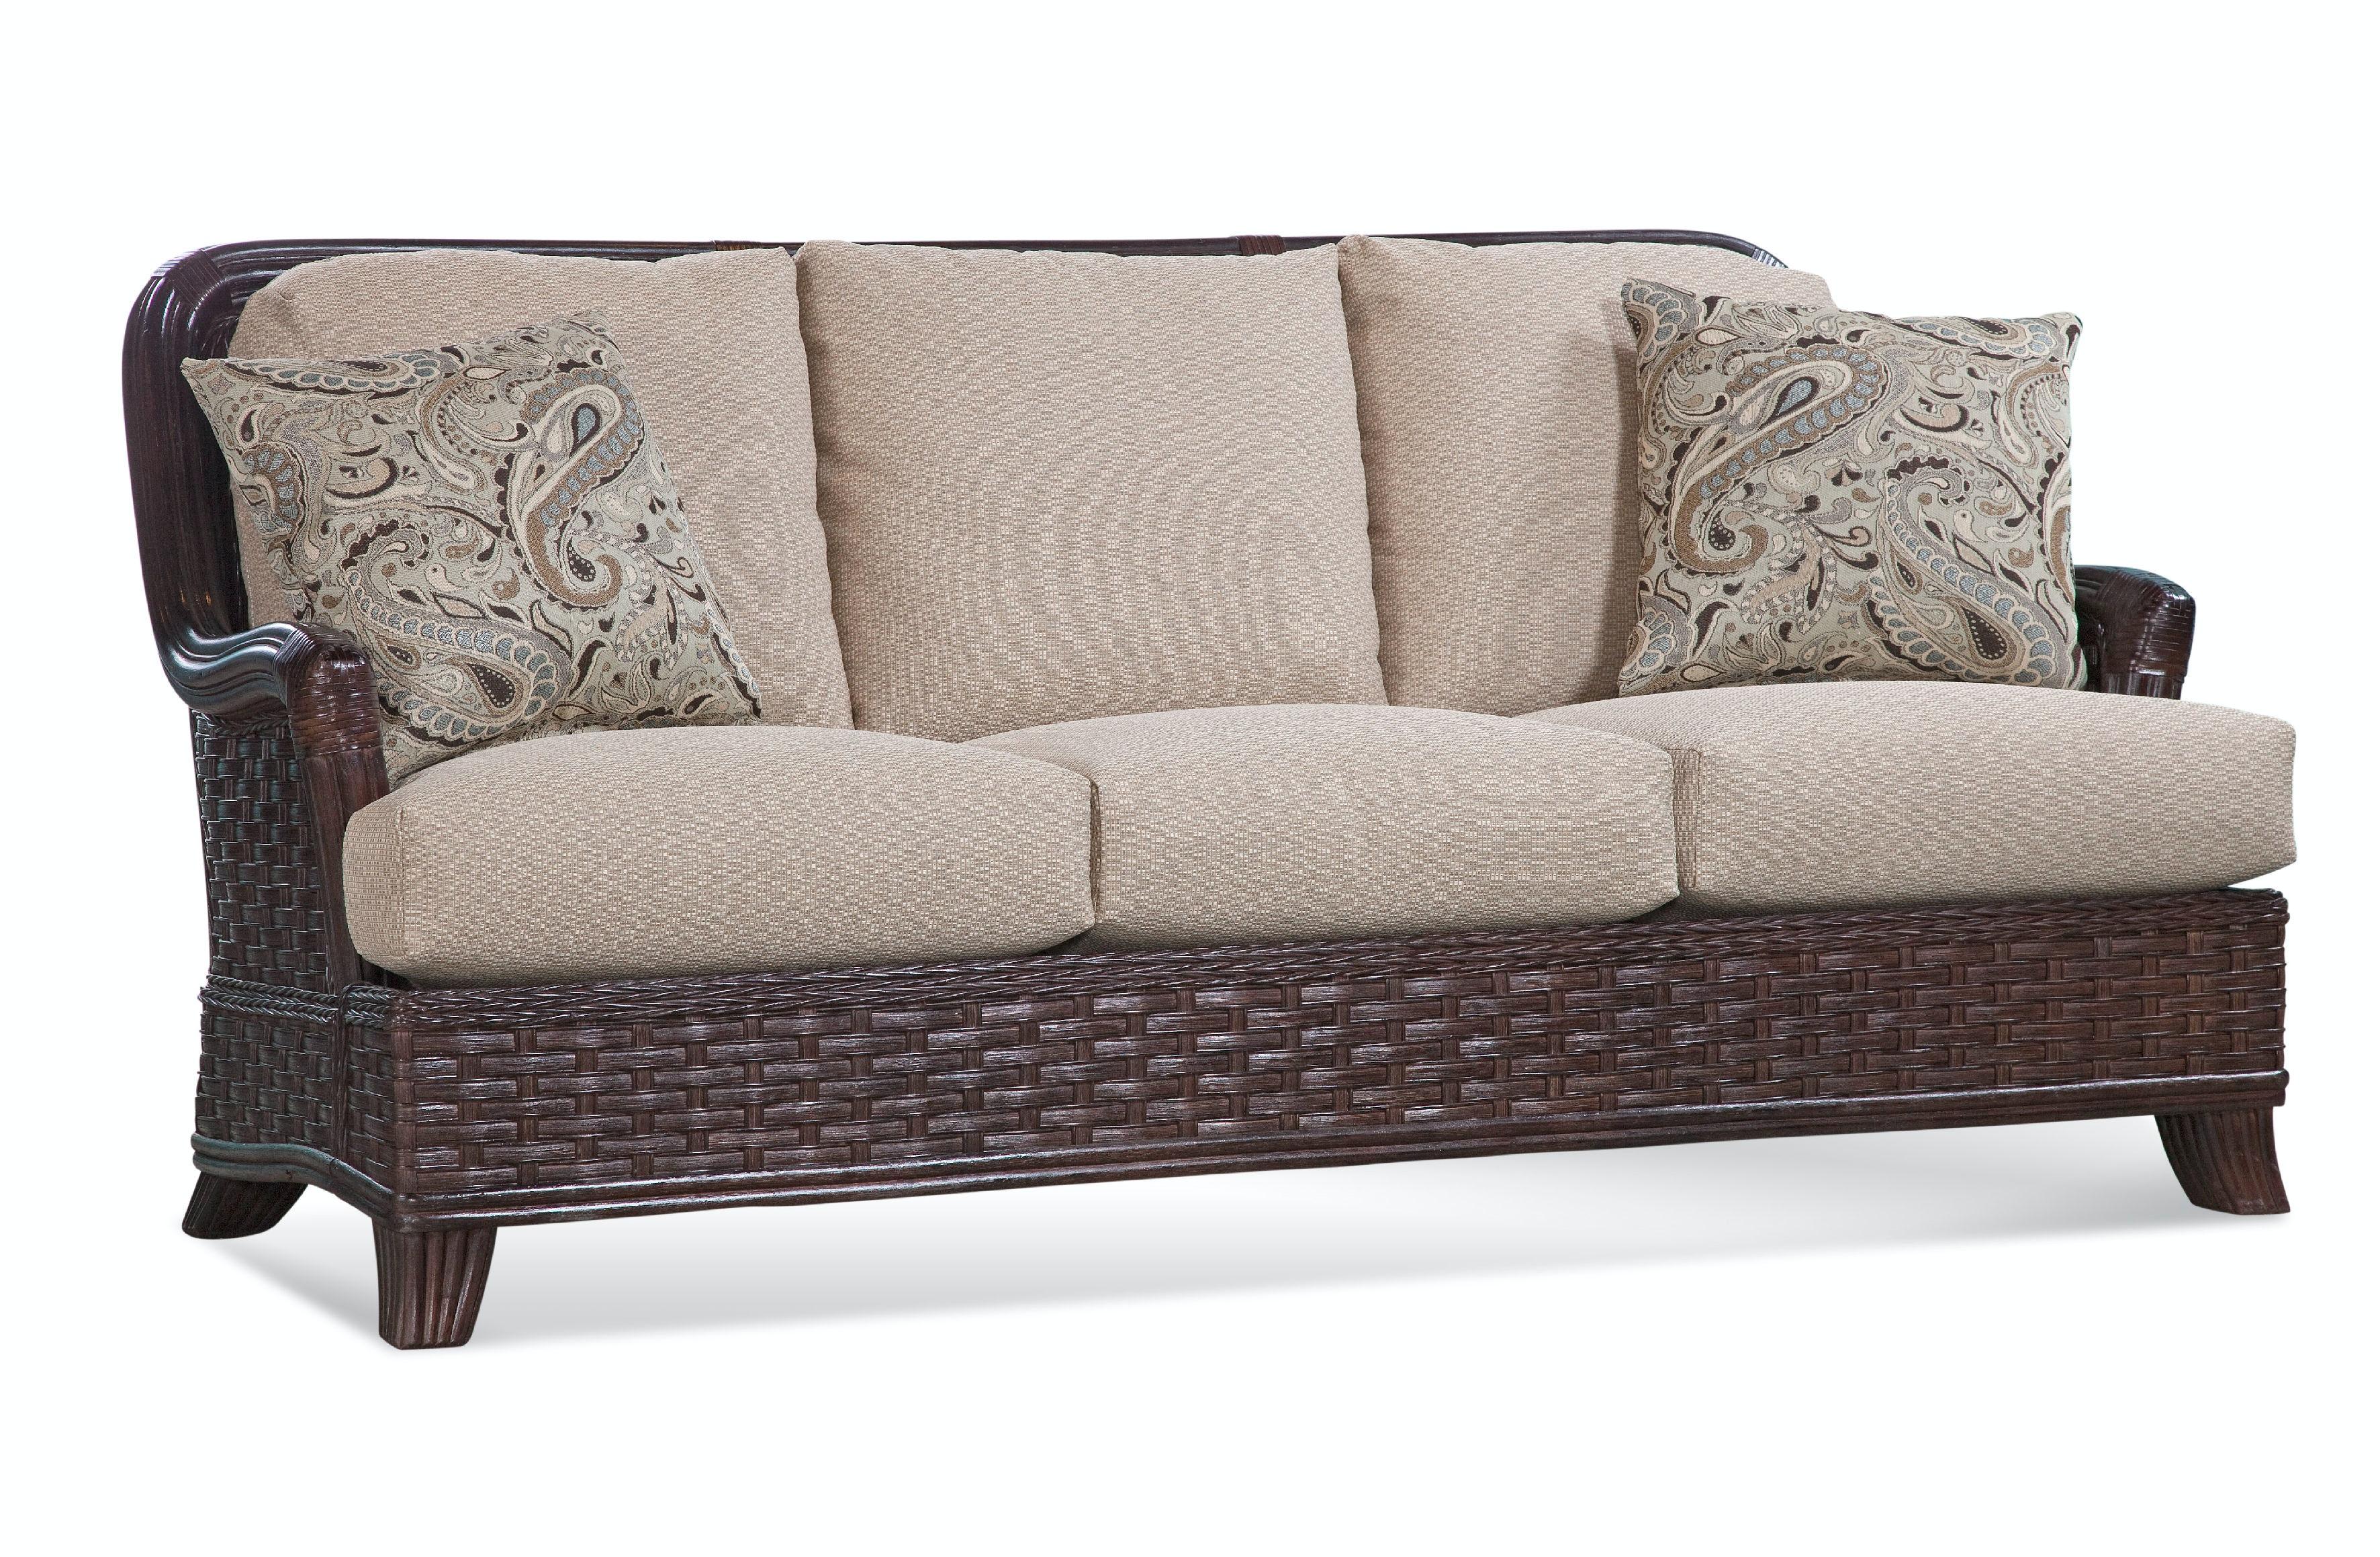 Spring Haven Sofa 253-011